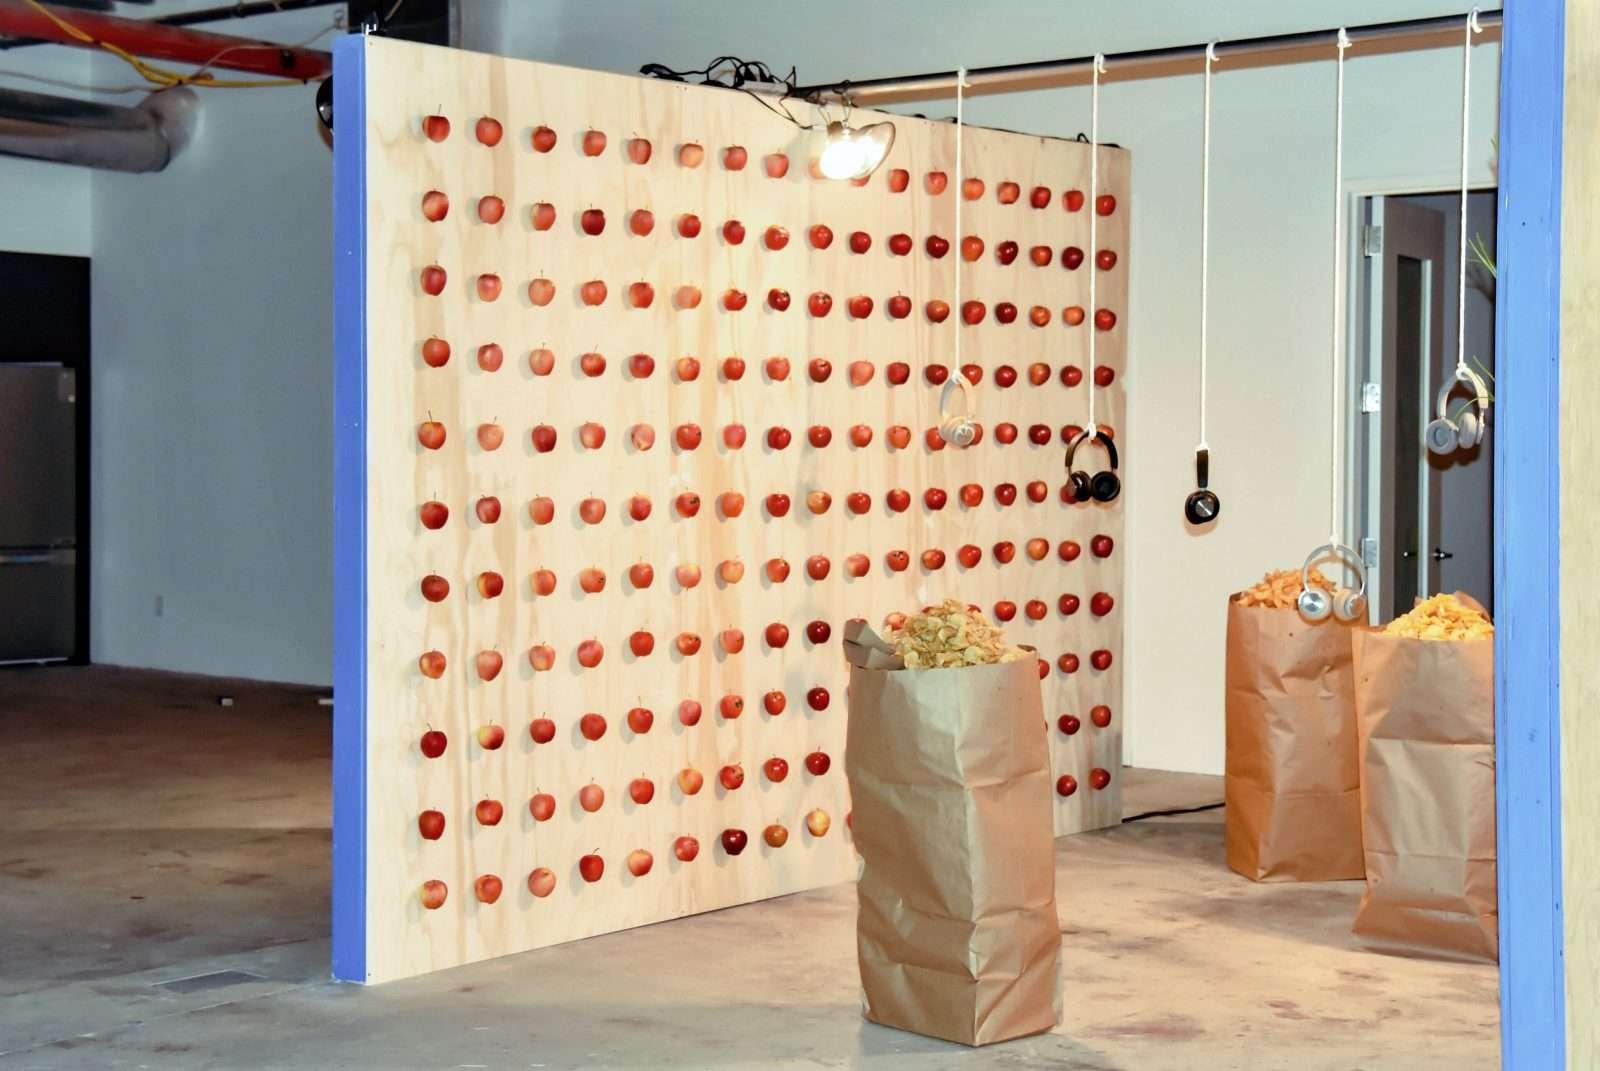 Fiz / Pop / Crunch | Bang & Olufsen |Laila Gohar